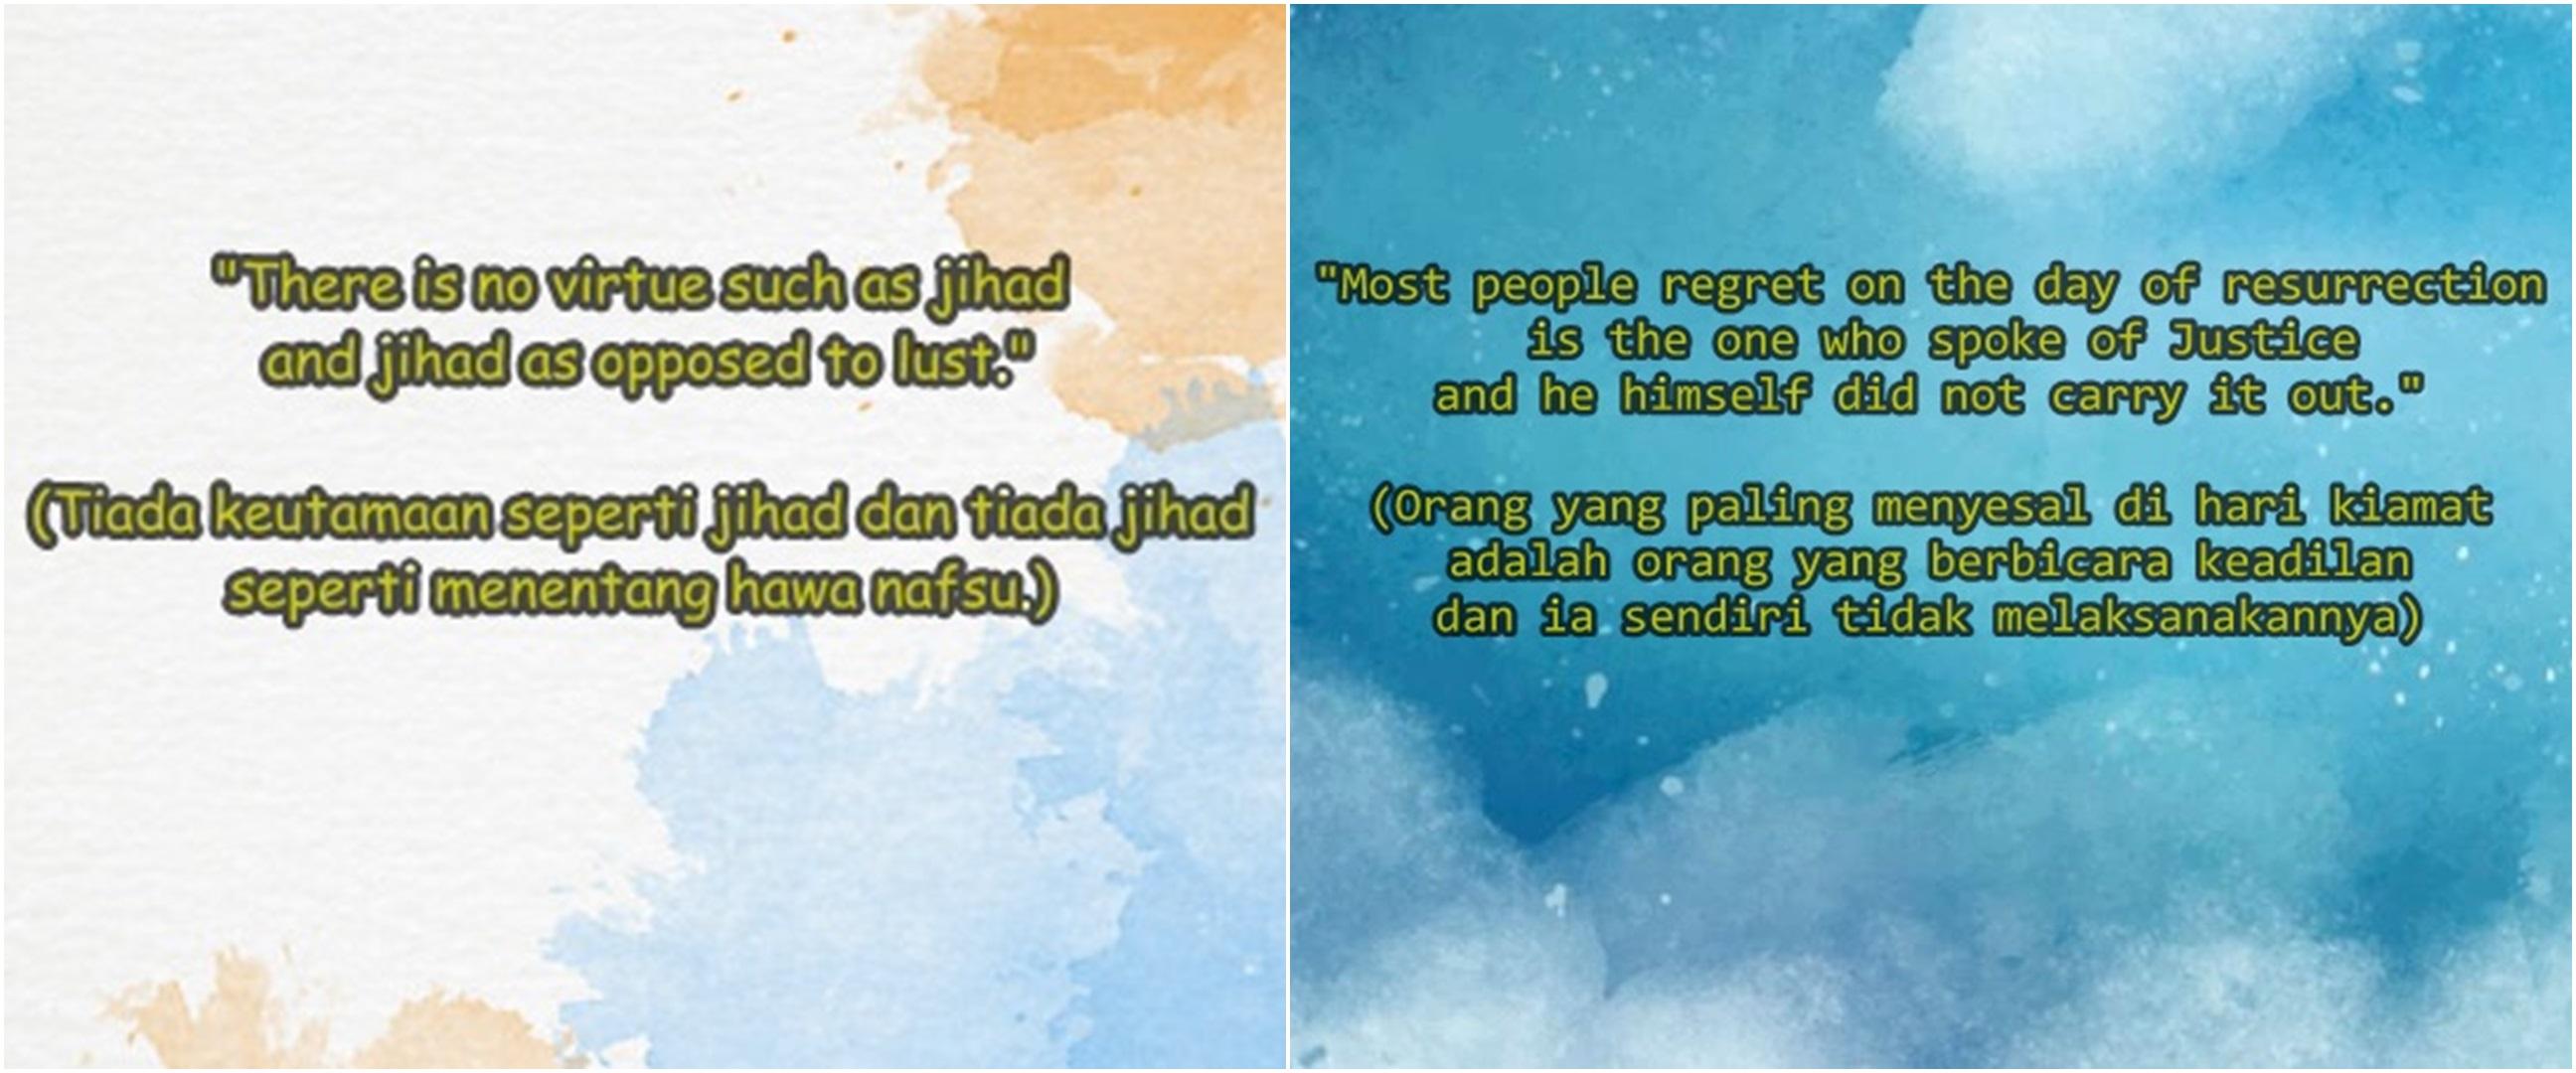 40 Kata-kata mutiara Islami bahasa Inggris dan artinya, penuh makna